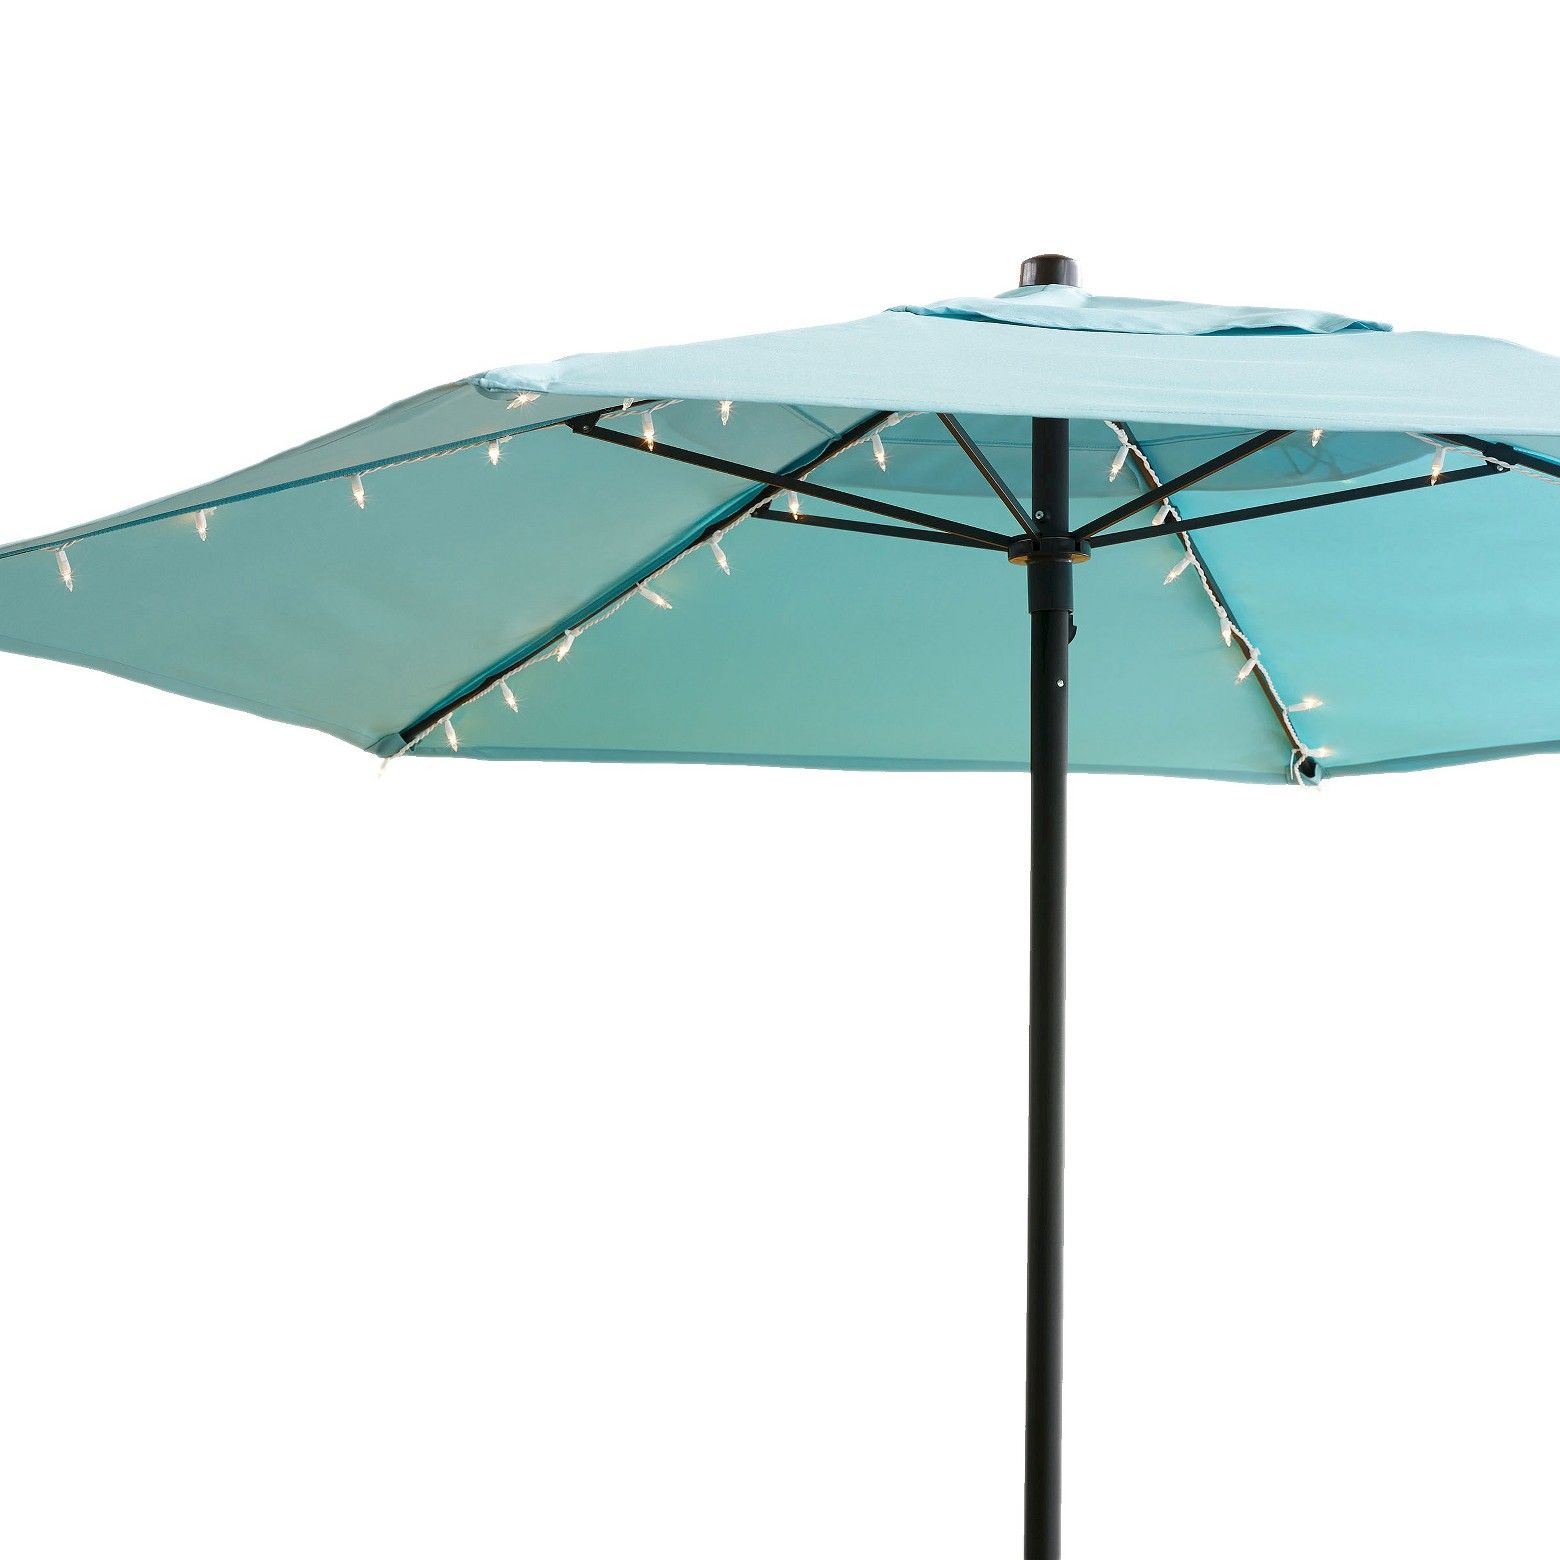 photography make umbrella equipment photo diy lighting to pin an for how light lights